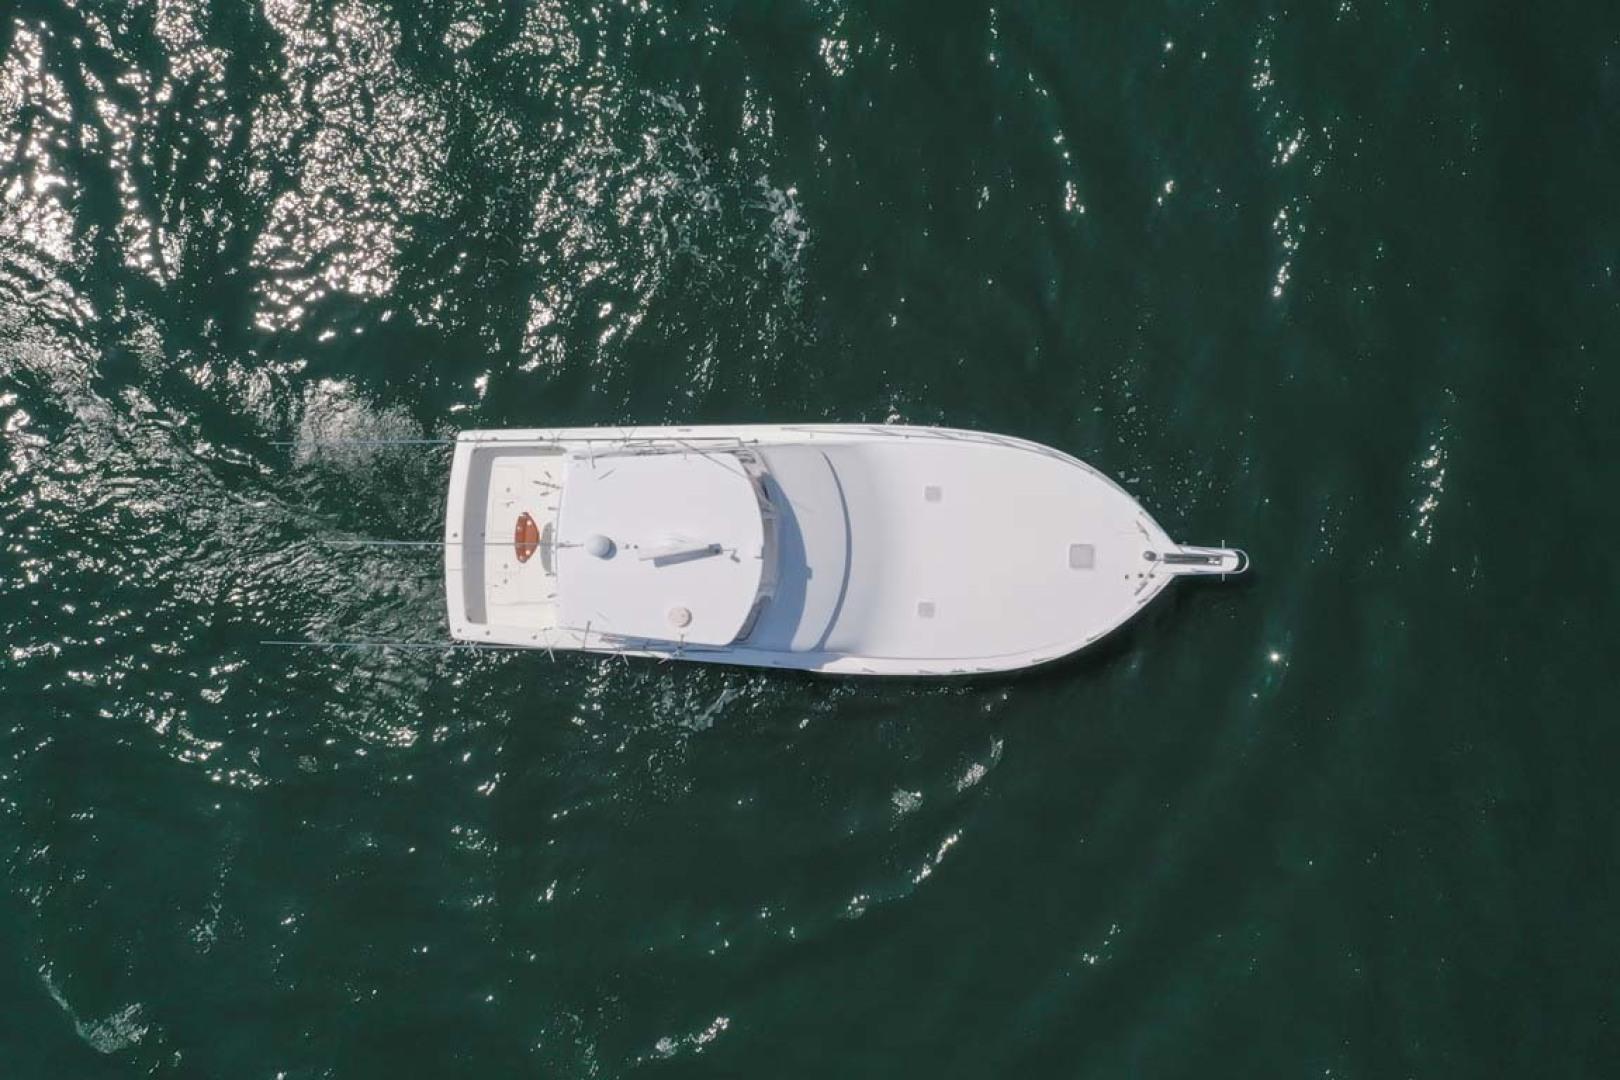 Viking-48 Convertible 2002-Sugaree PALM BEACH-Florida-United States-Overview-1348620 | Thumbnail